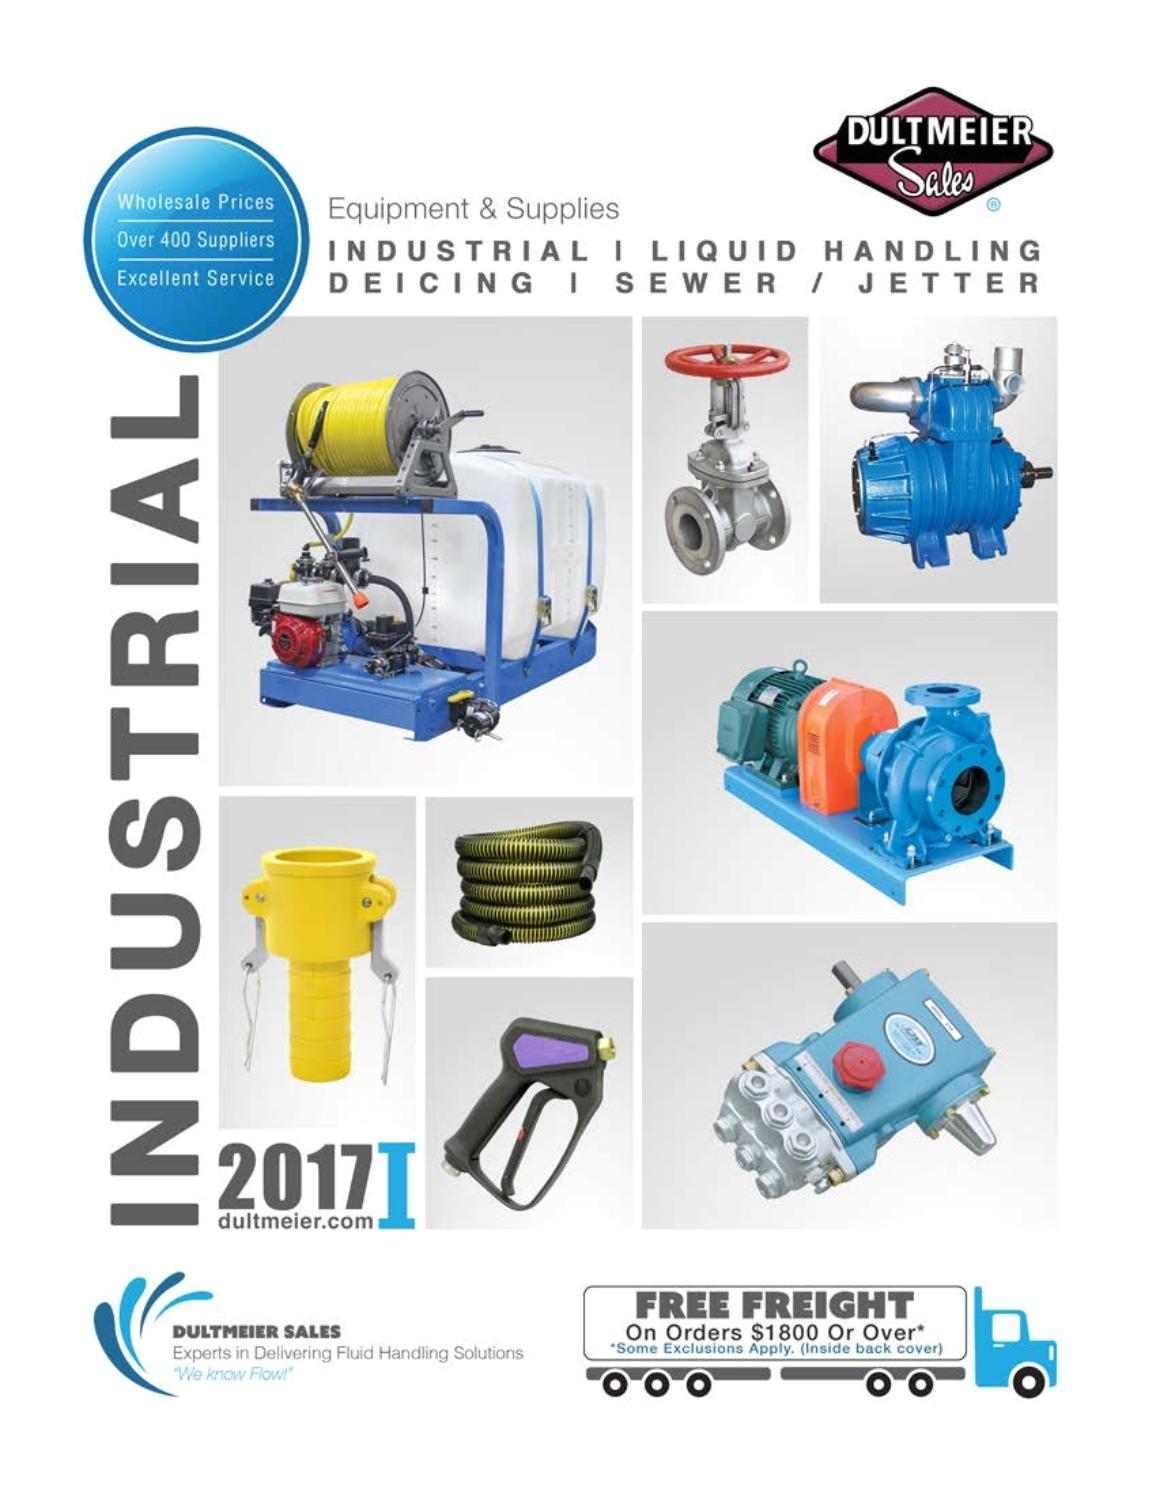 dultmeier sales 2017 industrial equipment supplies catalog a by dultmeier sales issuu